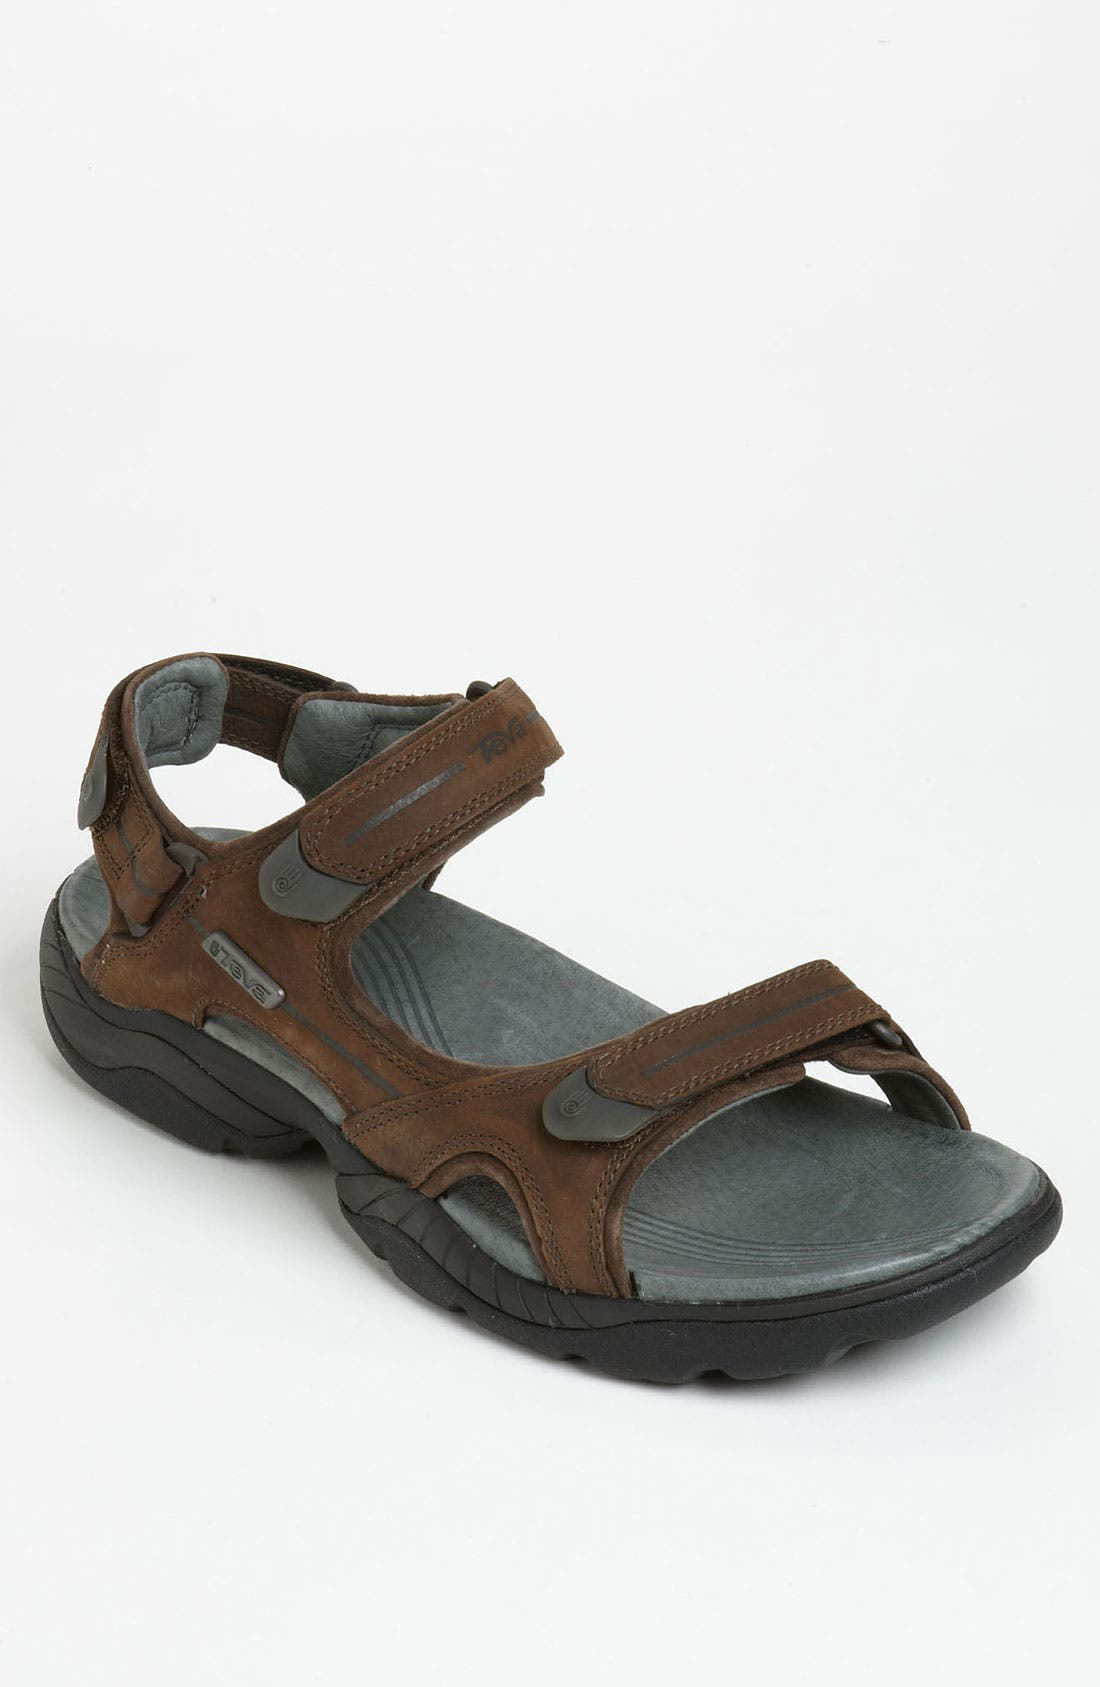 Main Image - Teva 'Obern' Sandal